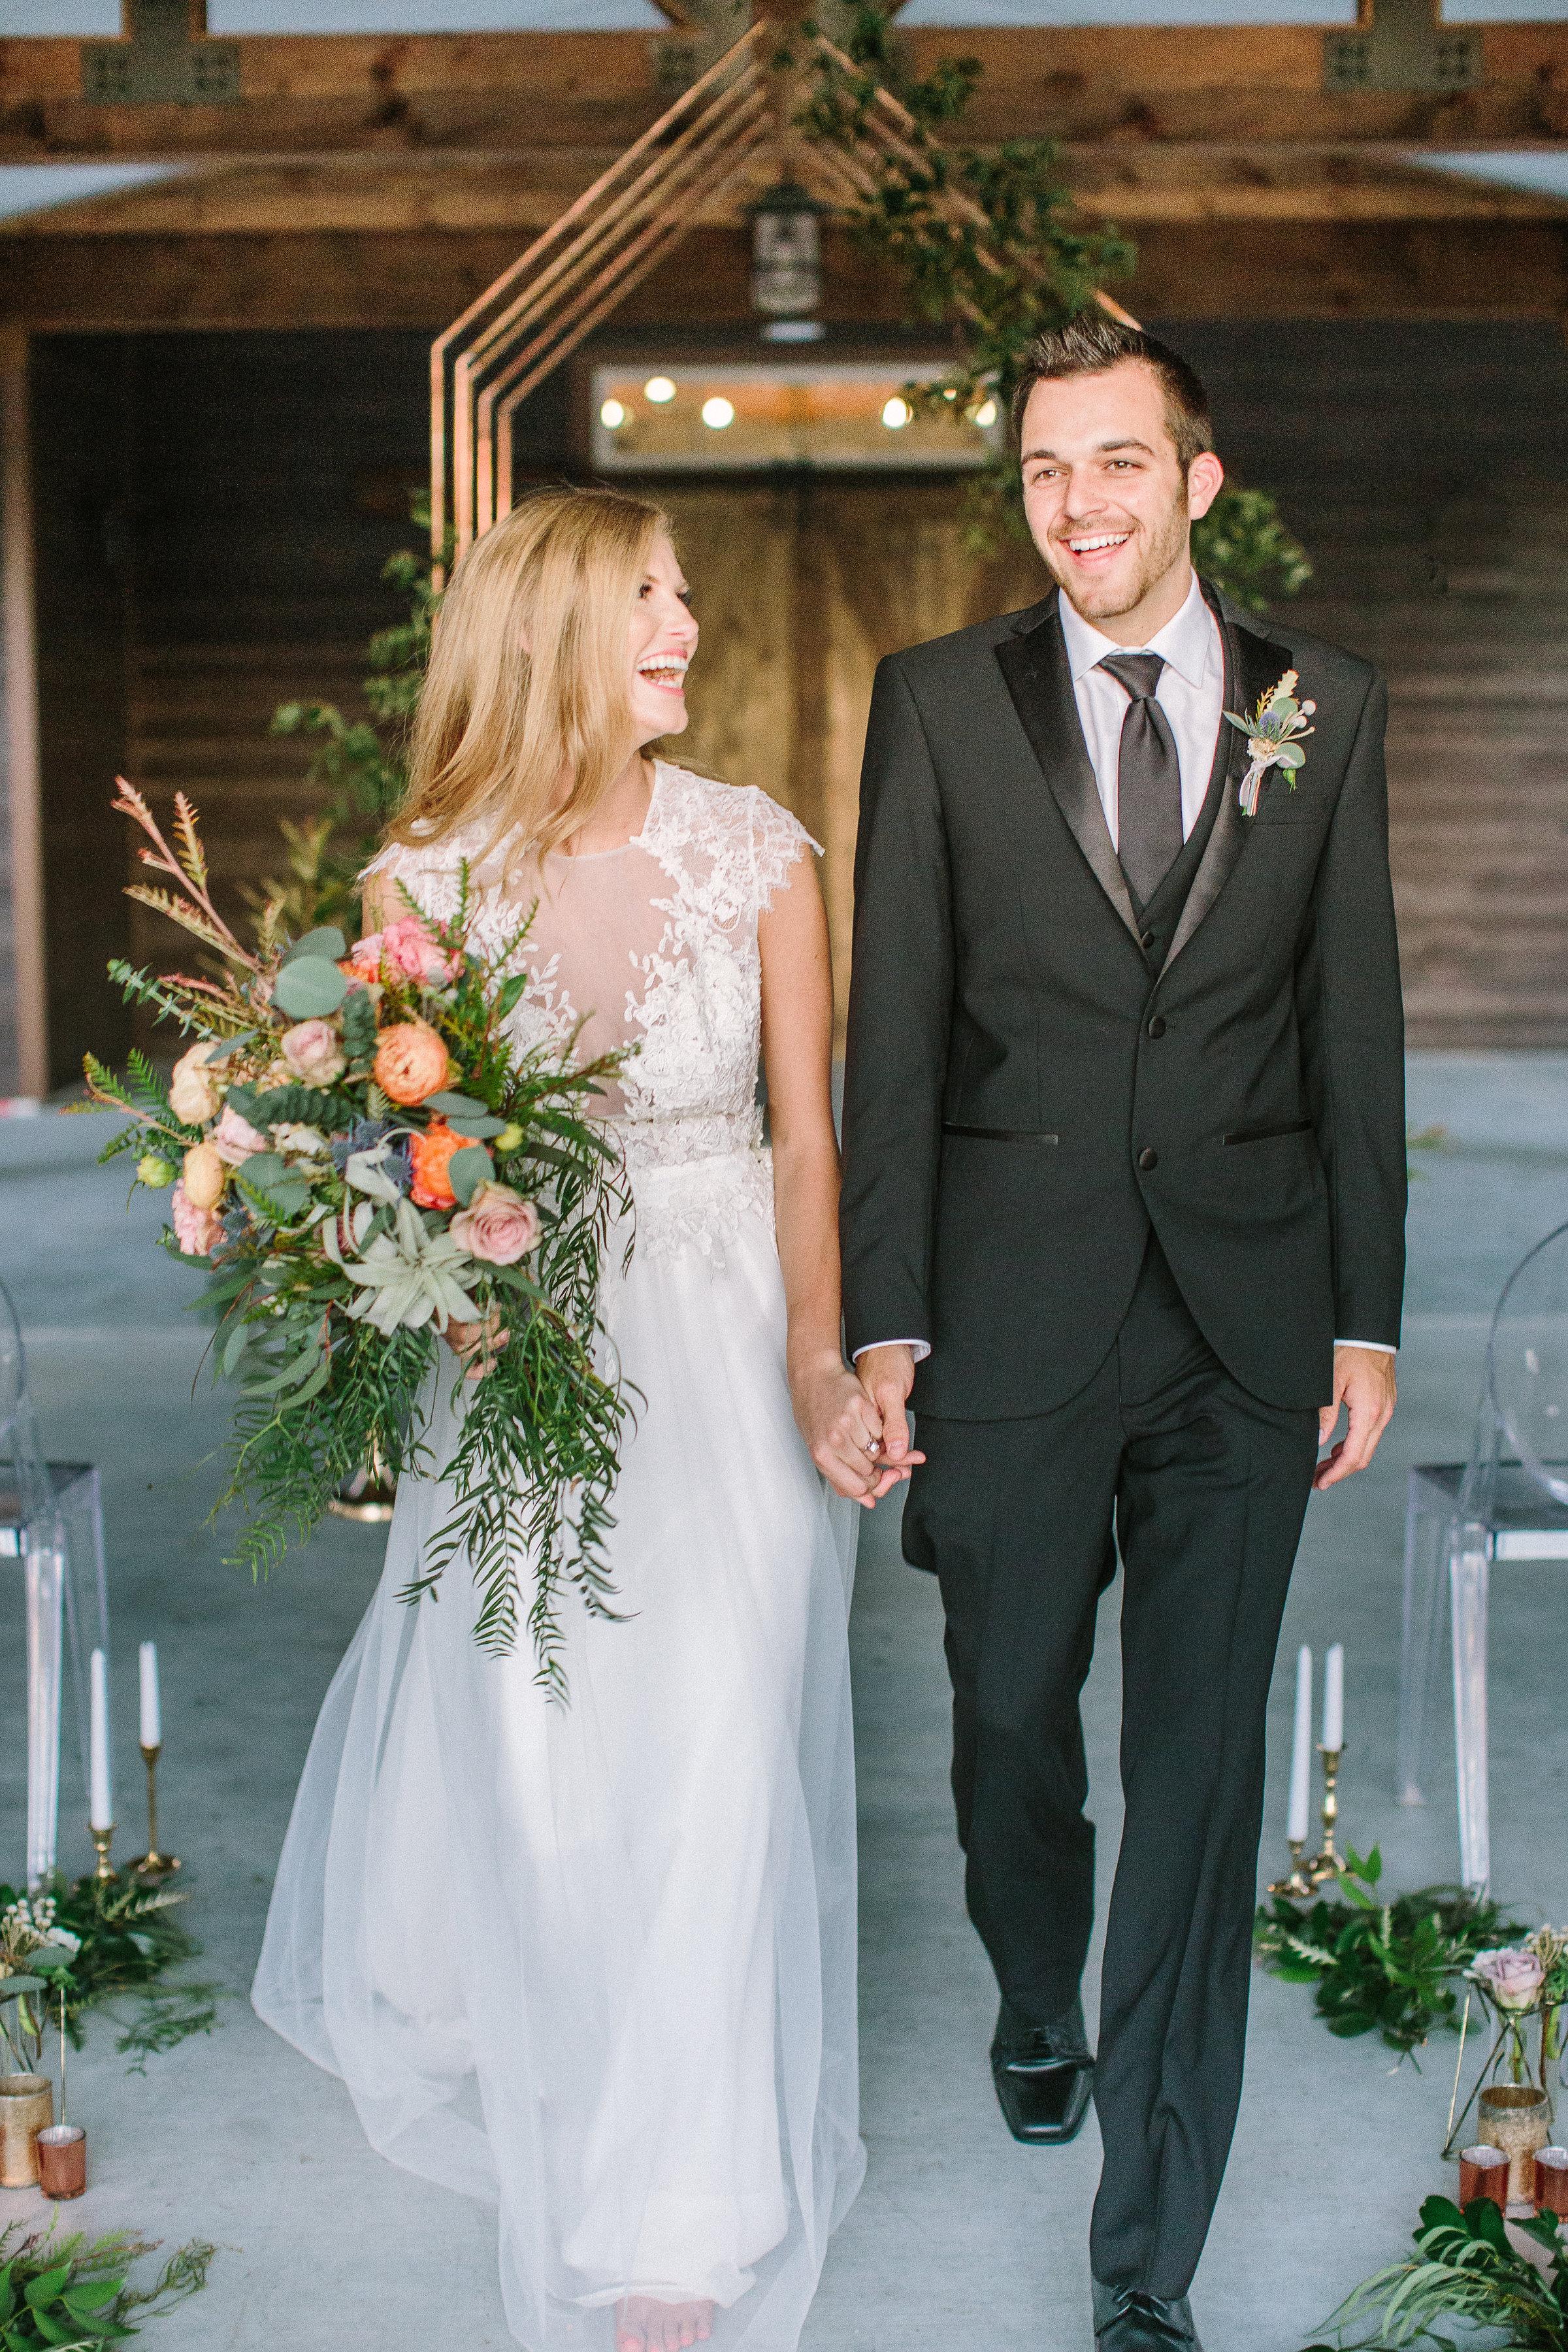 Ellen-Ashton-Photography-Peach-Creek-Ranch-Weddings-Wed-and-Prosper385.jpg